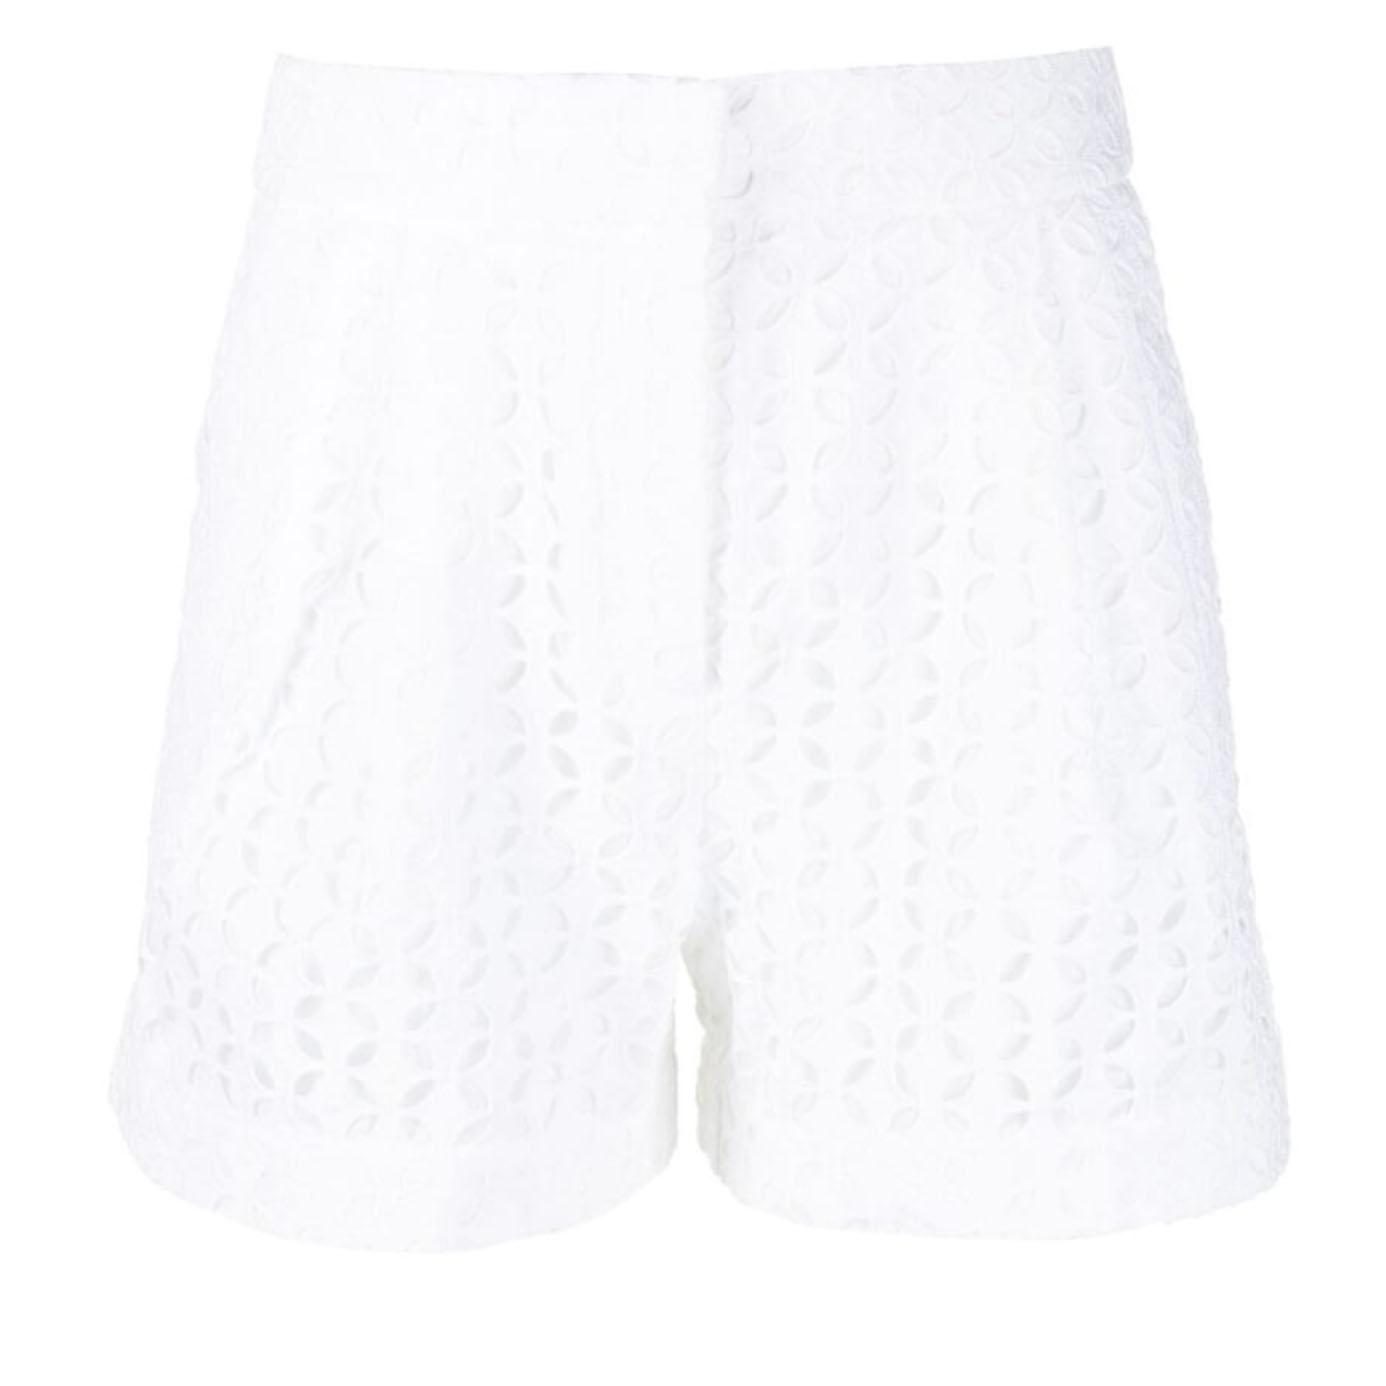 Michael Kors White Eyelet Shorts